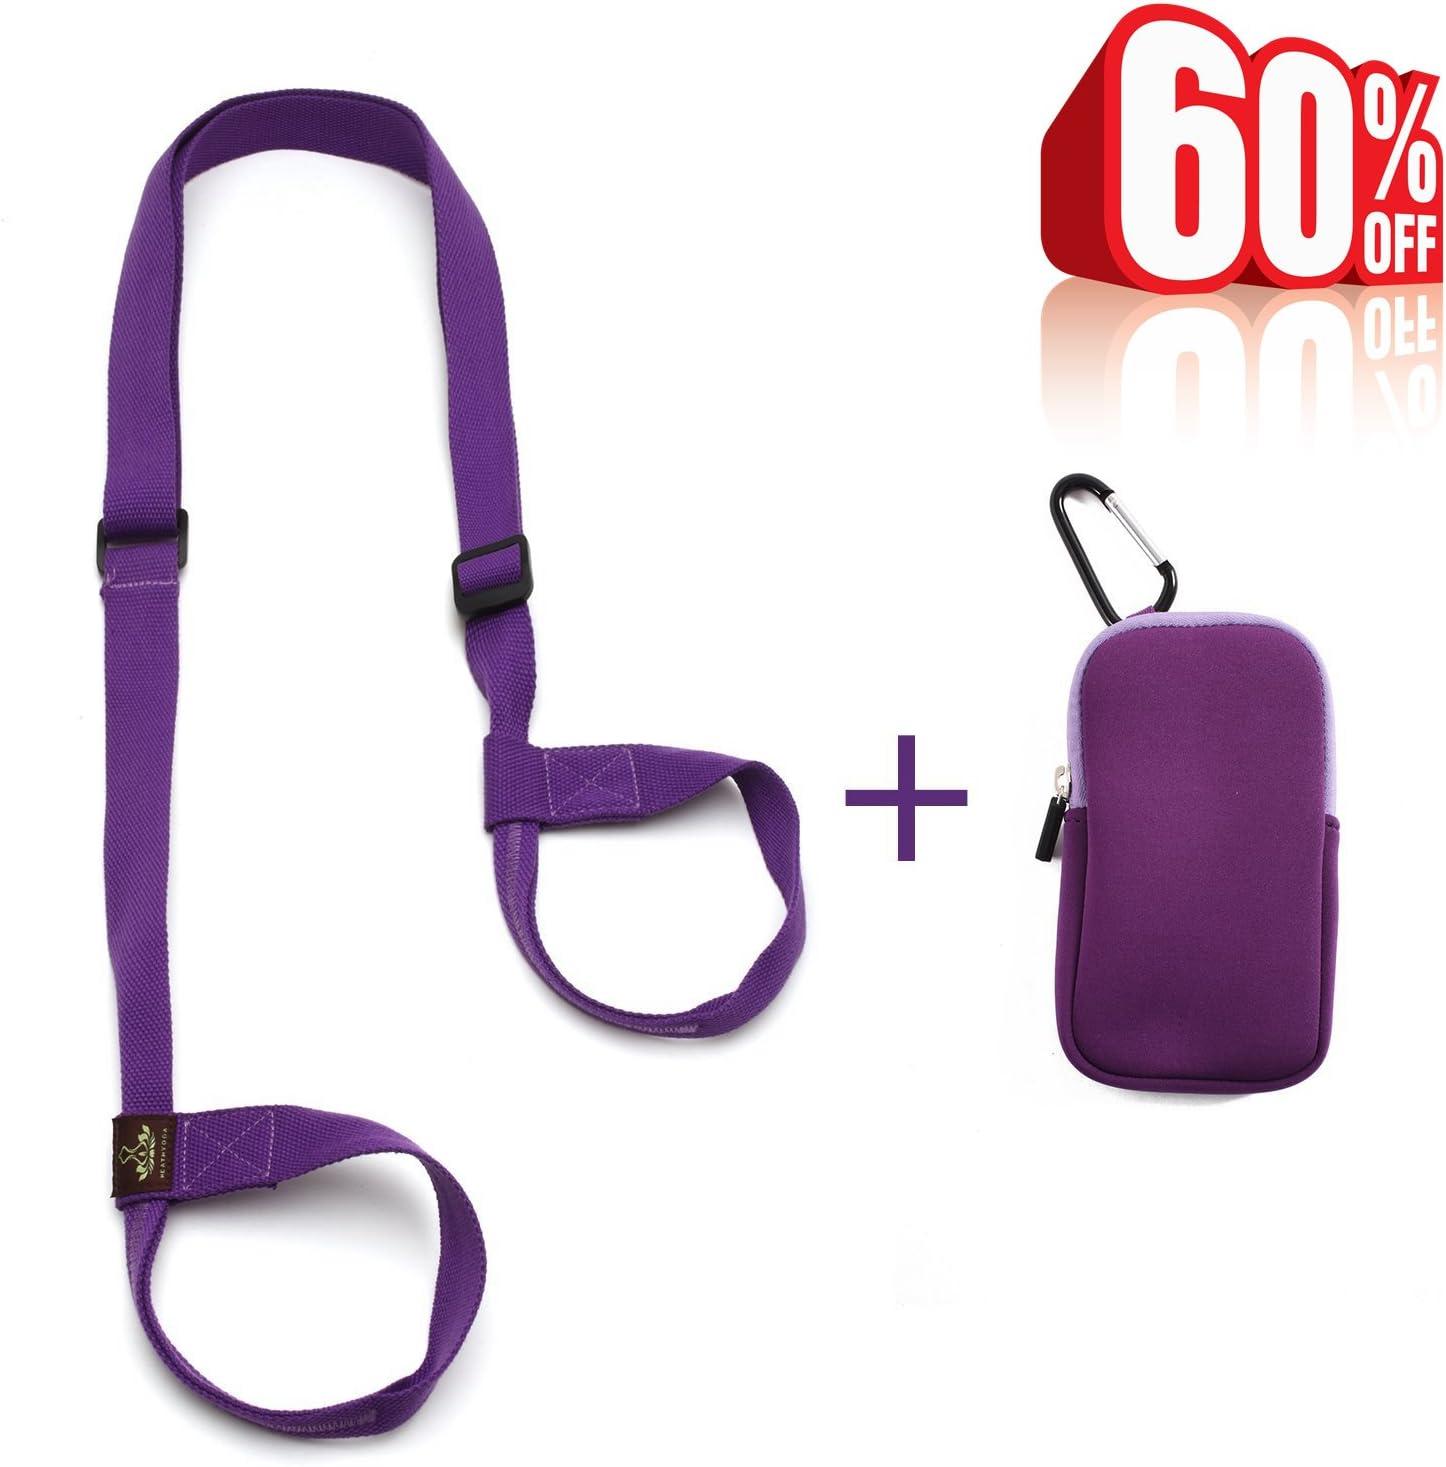 Heathyoga Yoga Mat Strap, Free Phone Keys Pouch, 100 Organic Cotton, Adjustable Yoga Strap Yoga Mats and Excecise Mats